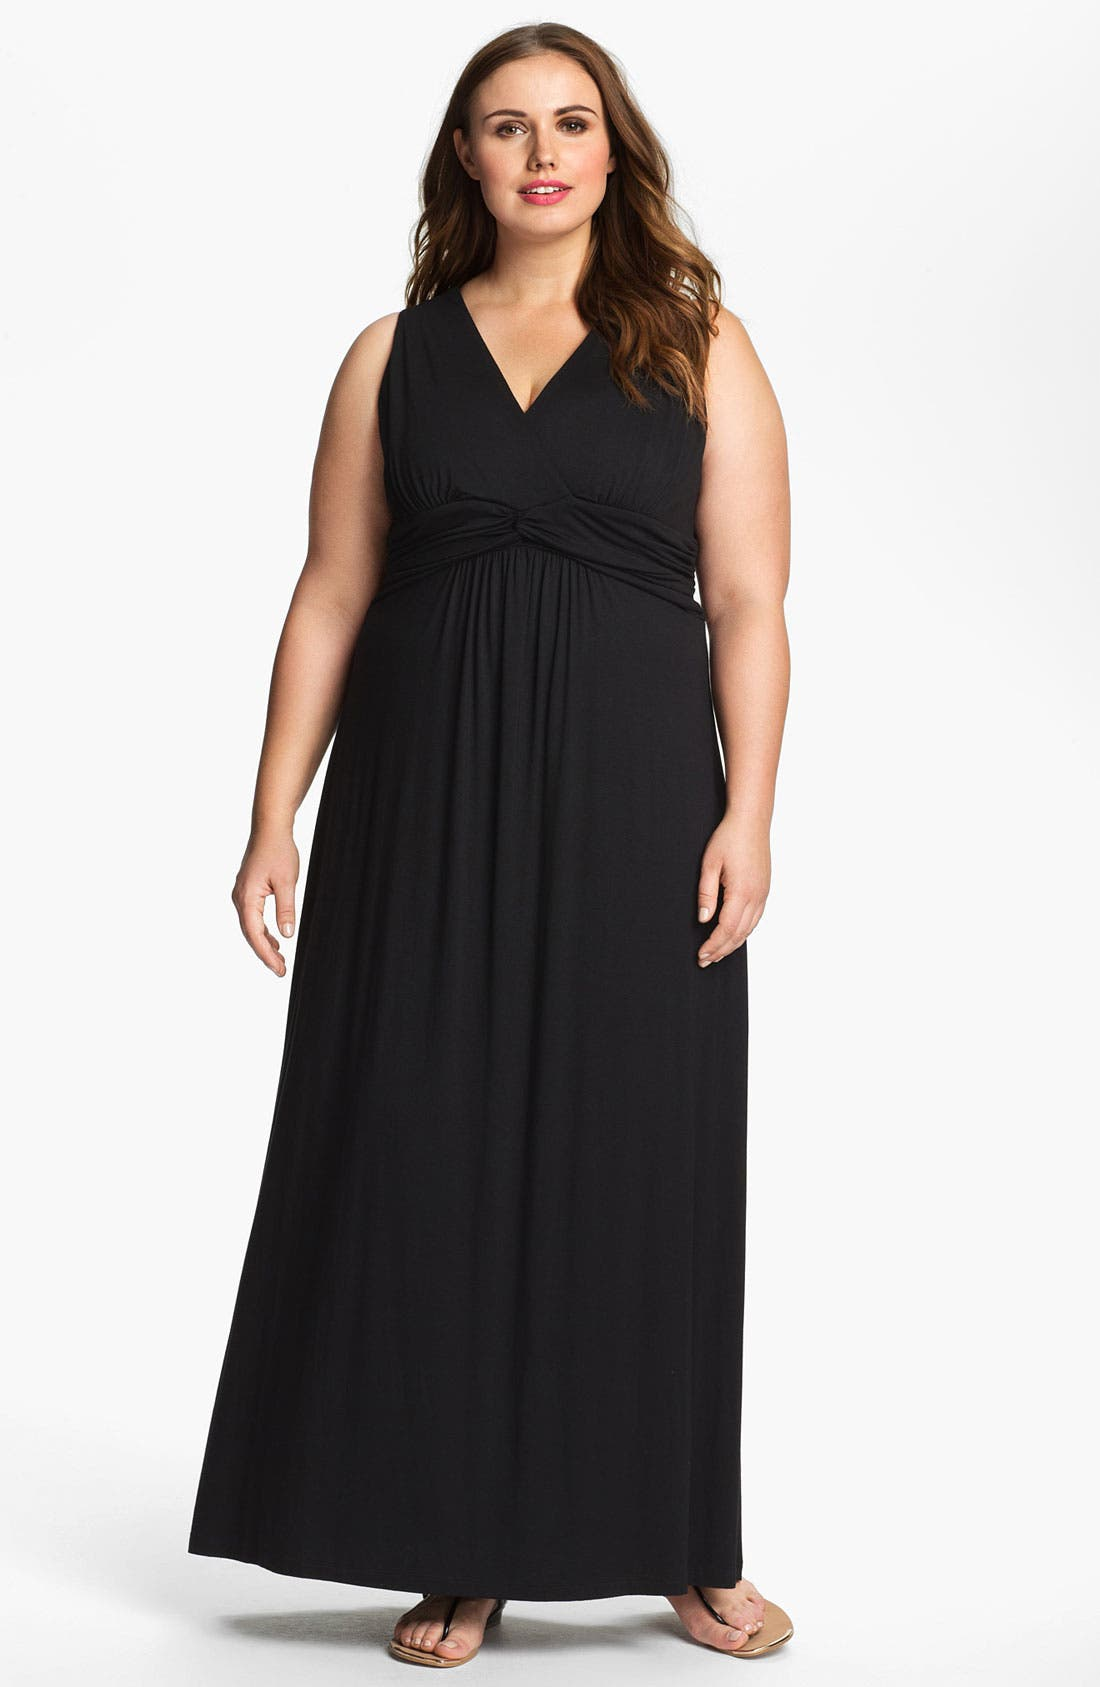 Alternate Image 1 Selected - Karen Kane Front Twist Sleeveless Maxi Dress (Plus Size) (Online Only)